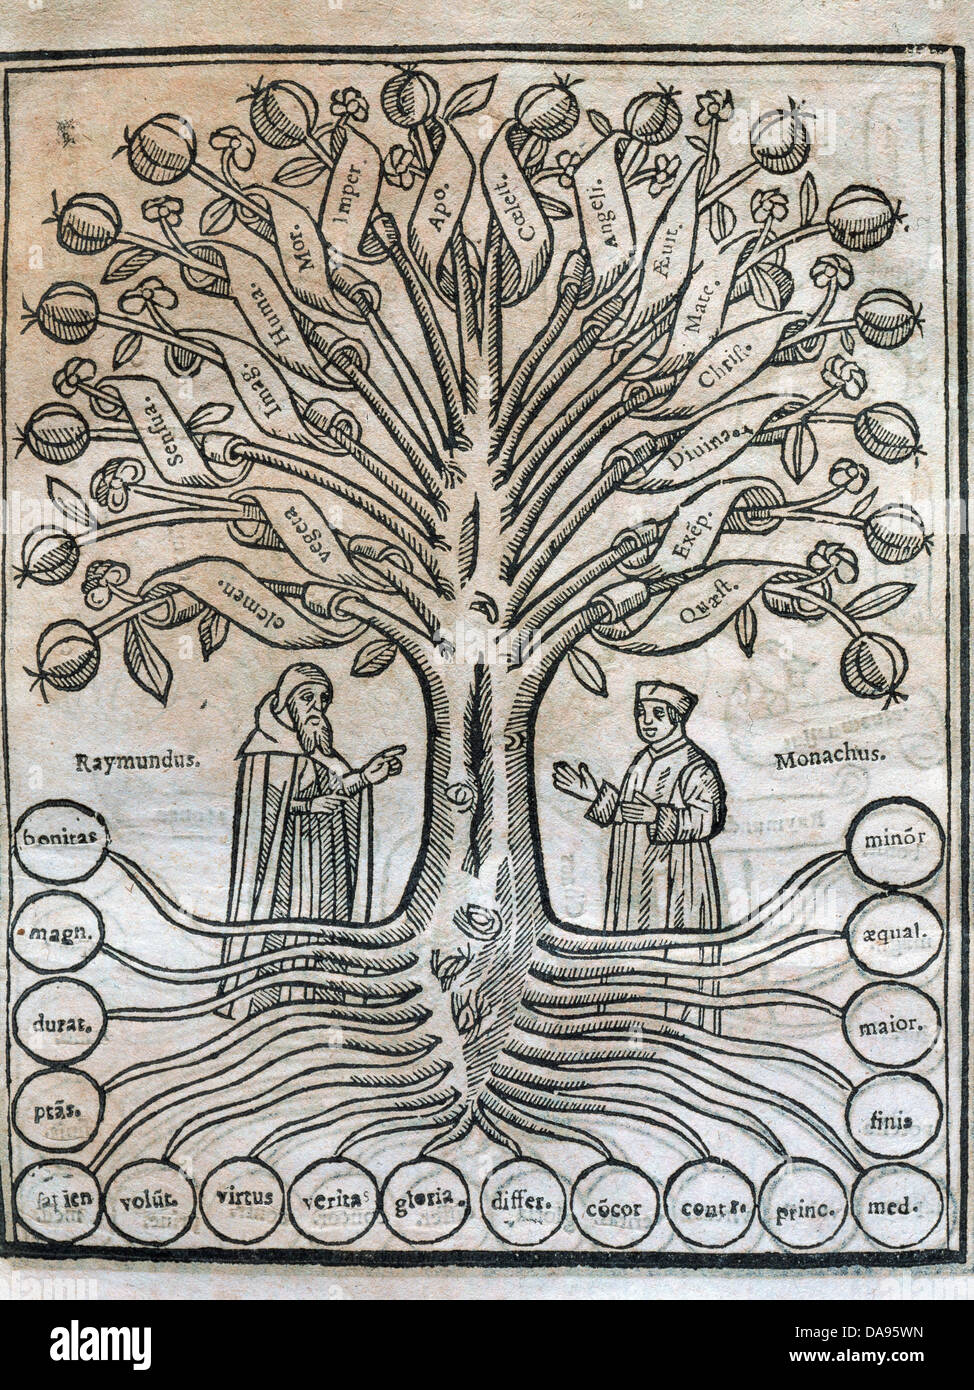 "Llull, Ramon (1233/1235-1315/1316). Mallorquinischen Schriftstellers und Philosophen.  ""Arbor Scientiae"" Stockbild"